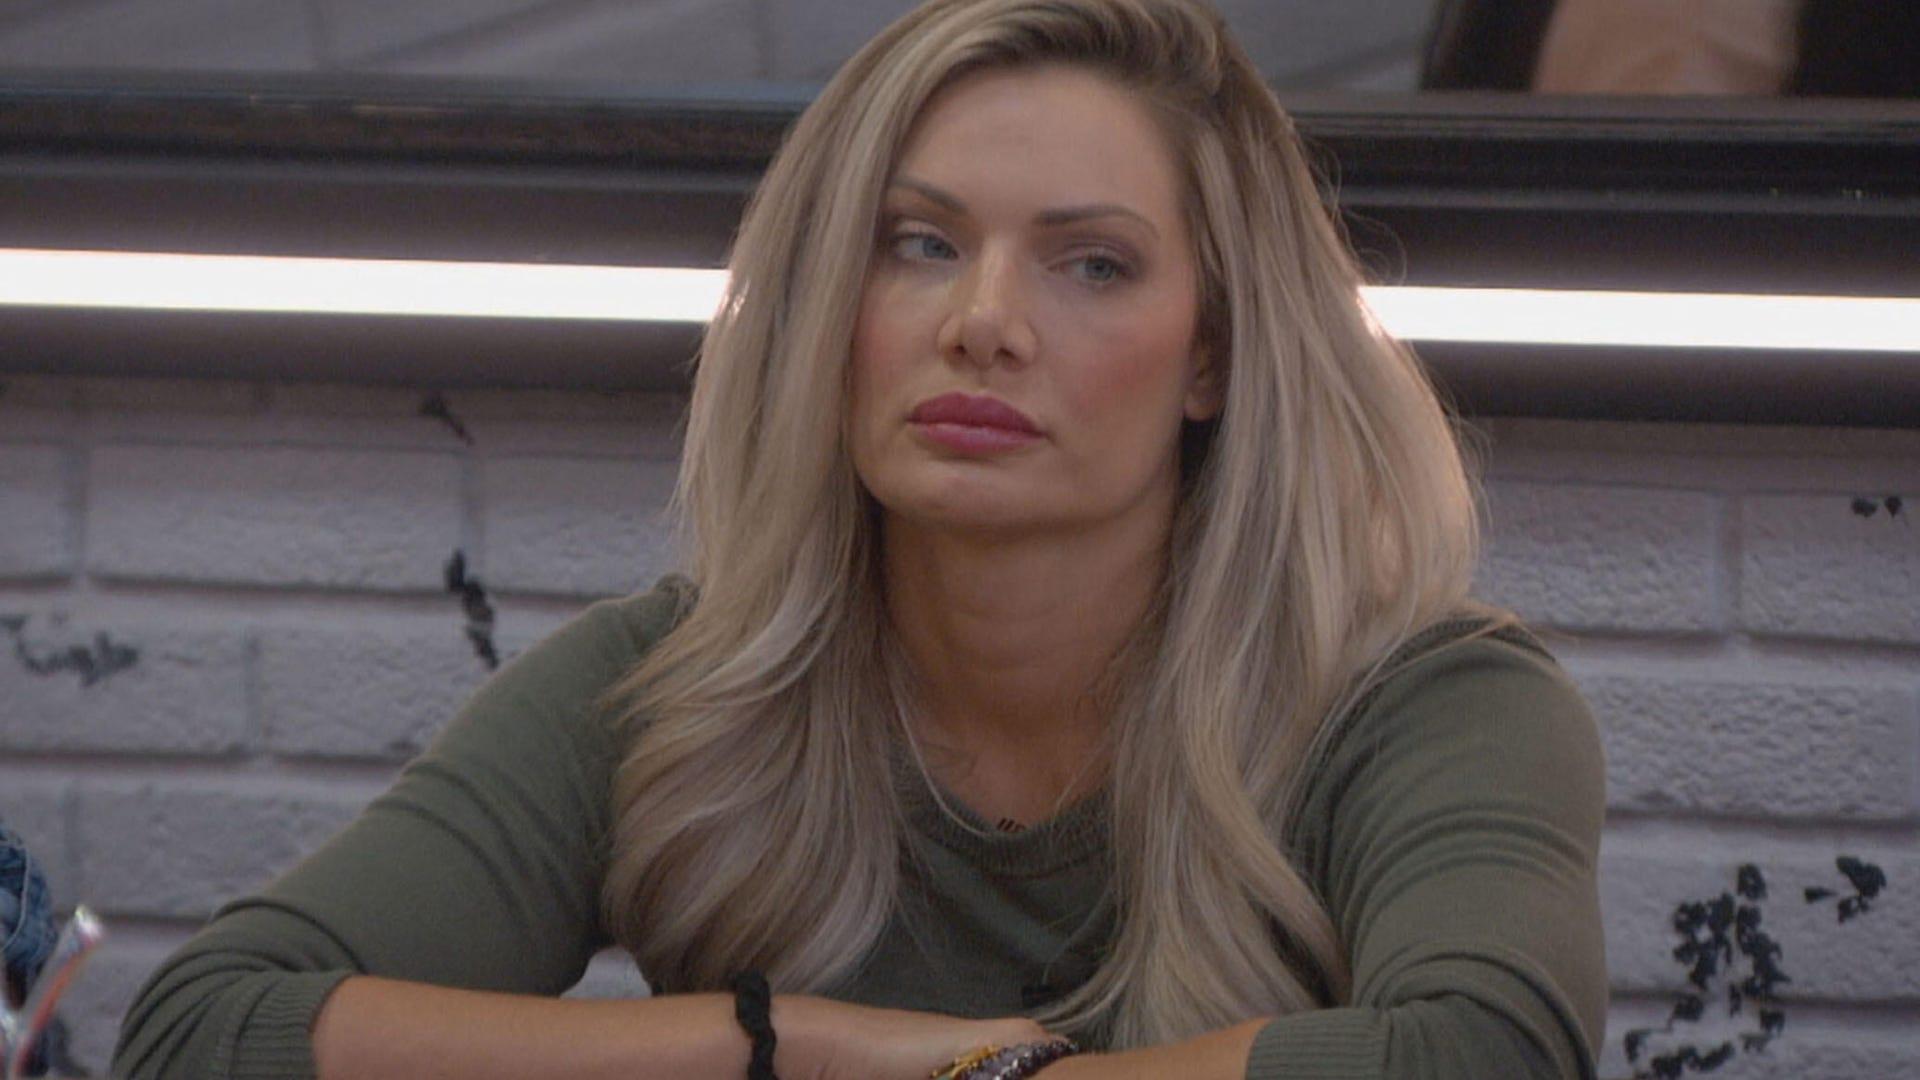 Janelle Pierzina, Big Brother All-Stars